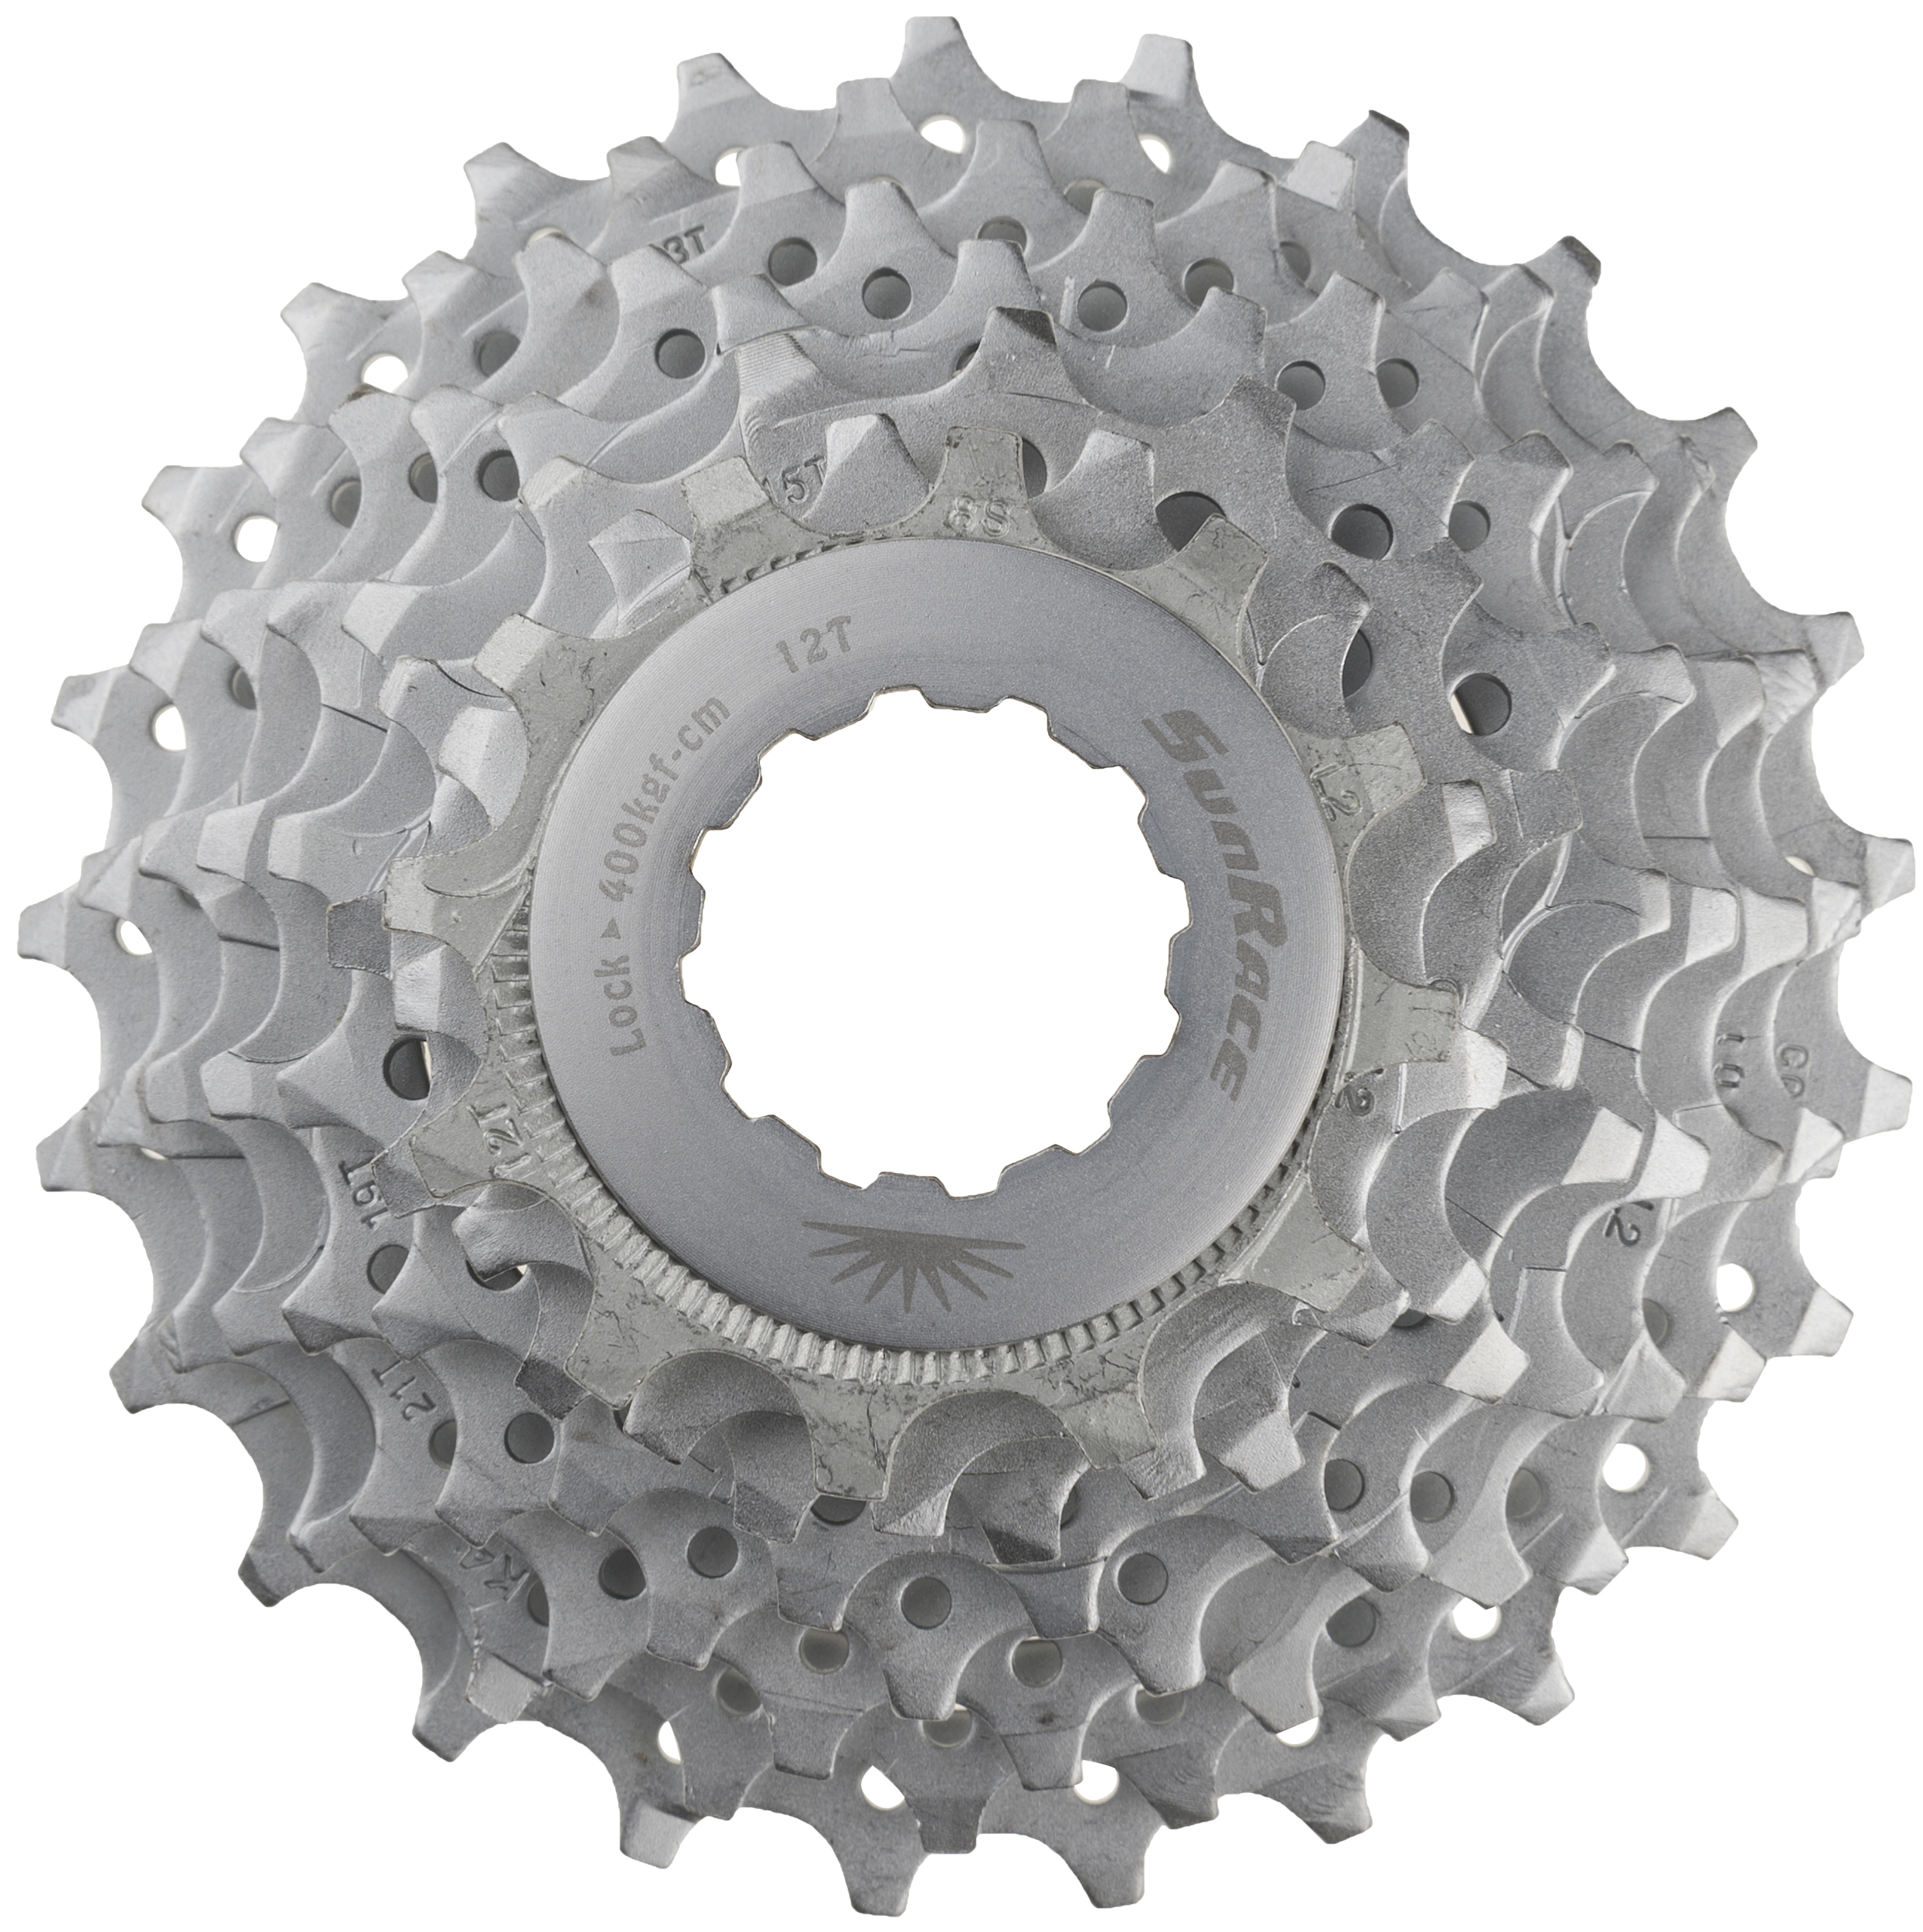 Compatible 12-25 8 Speed Sunrace Road Bike Cassette Shimano or Sram